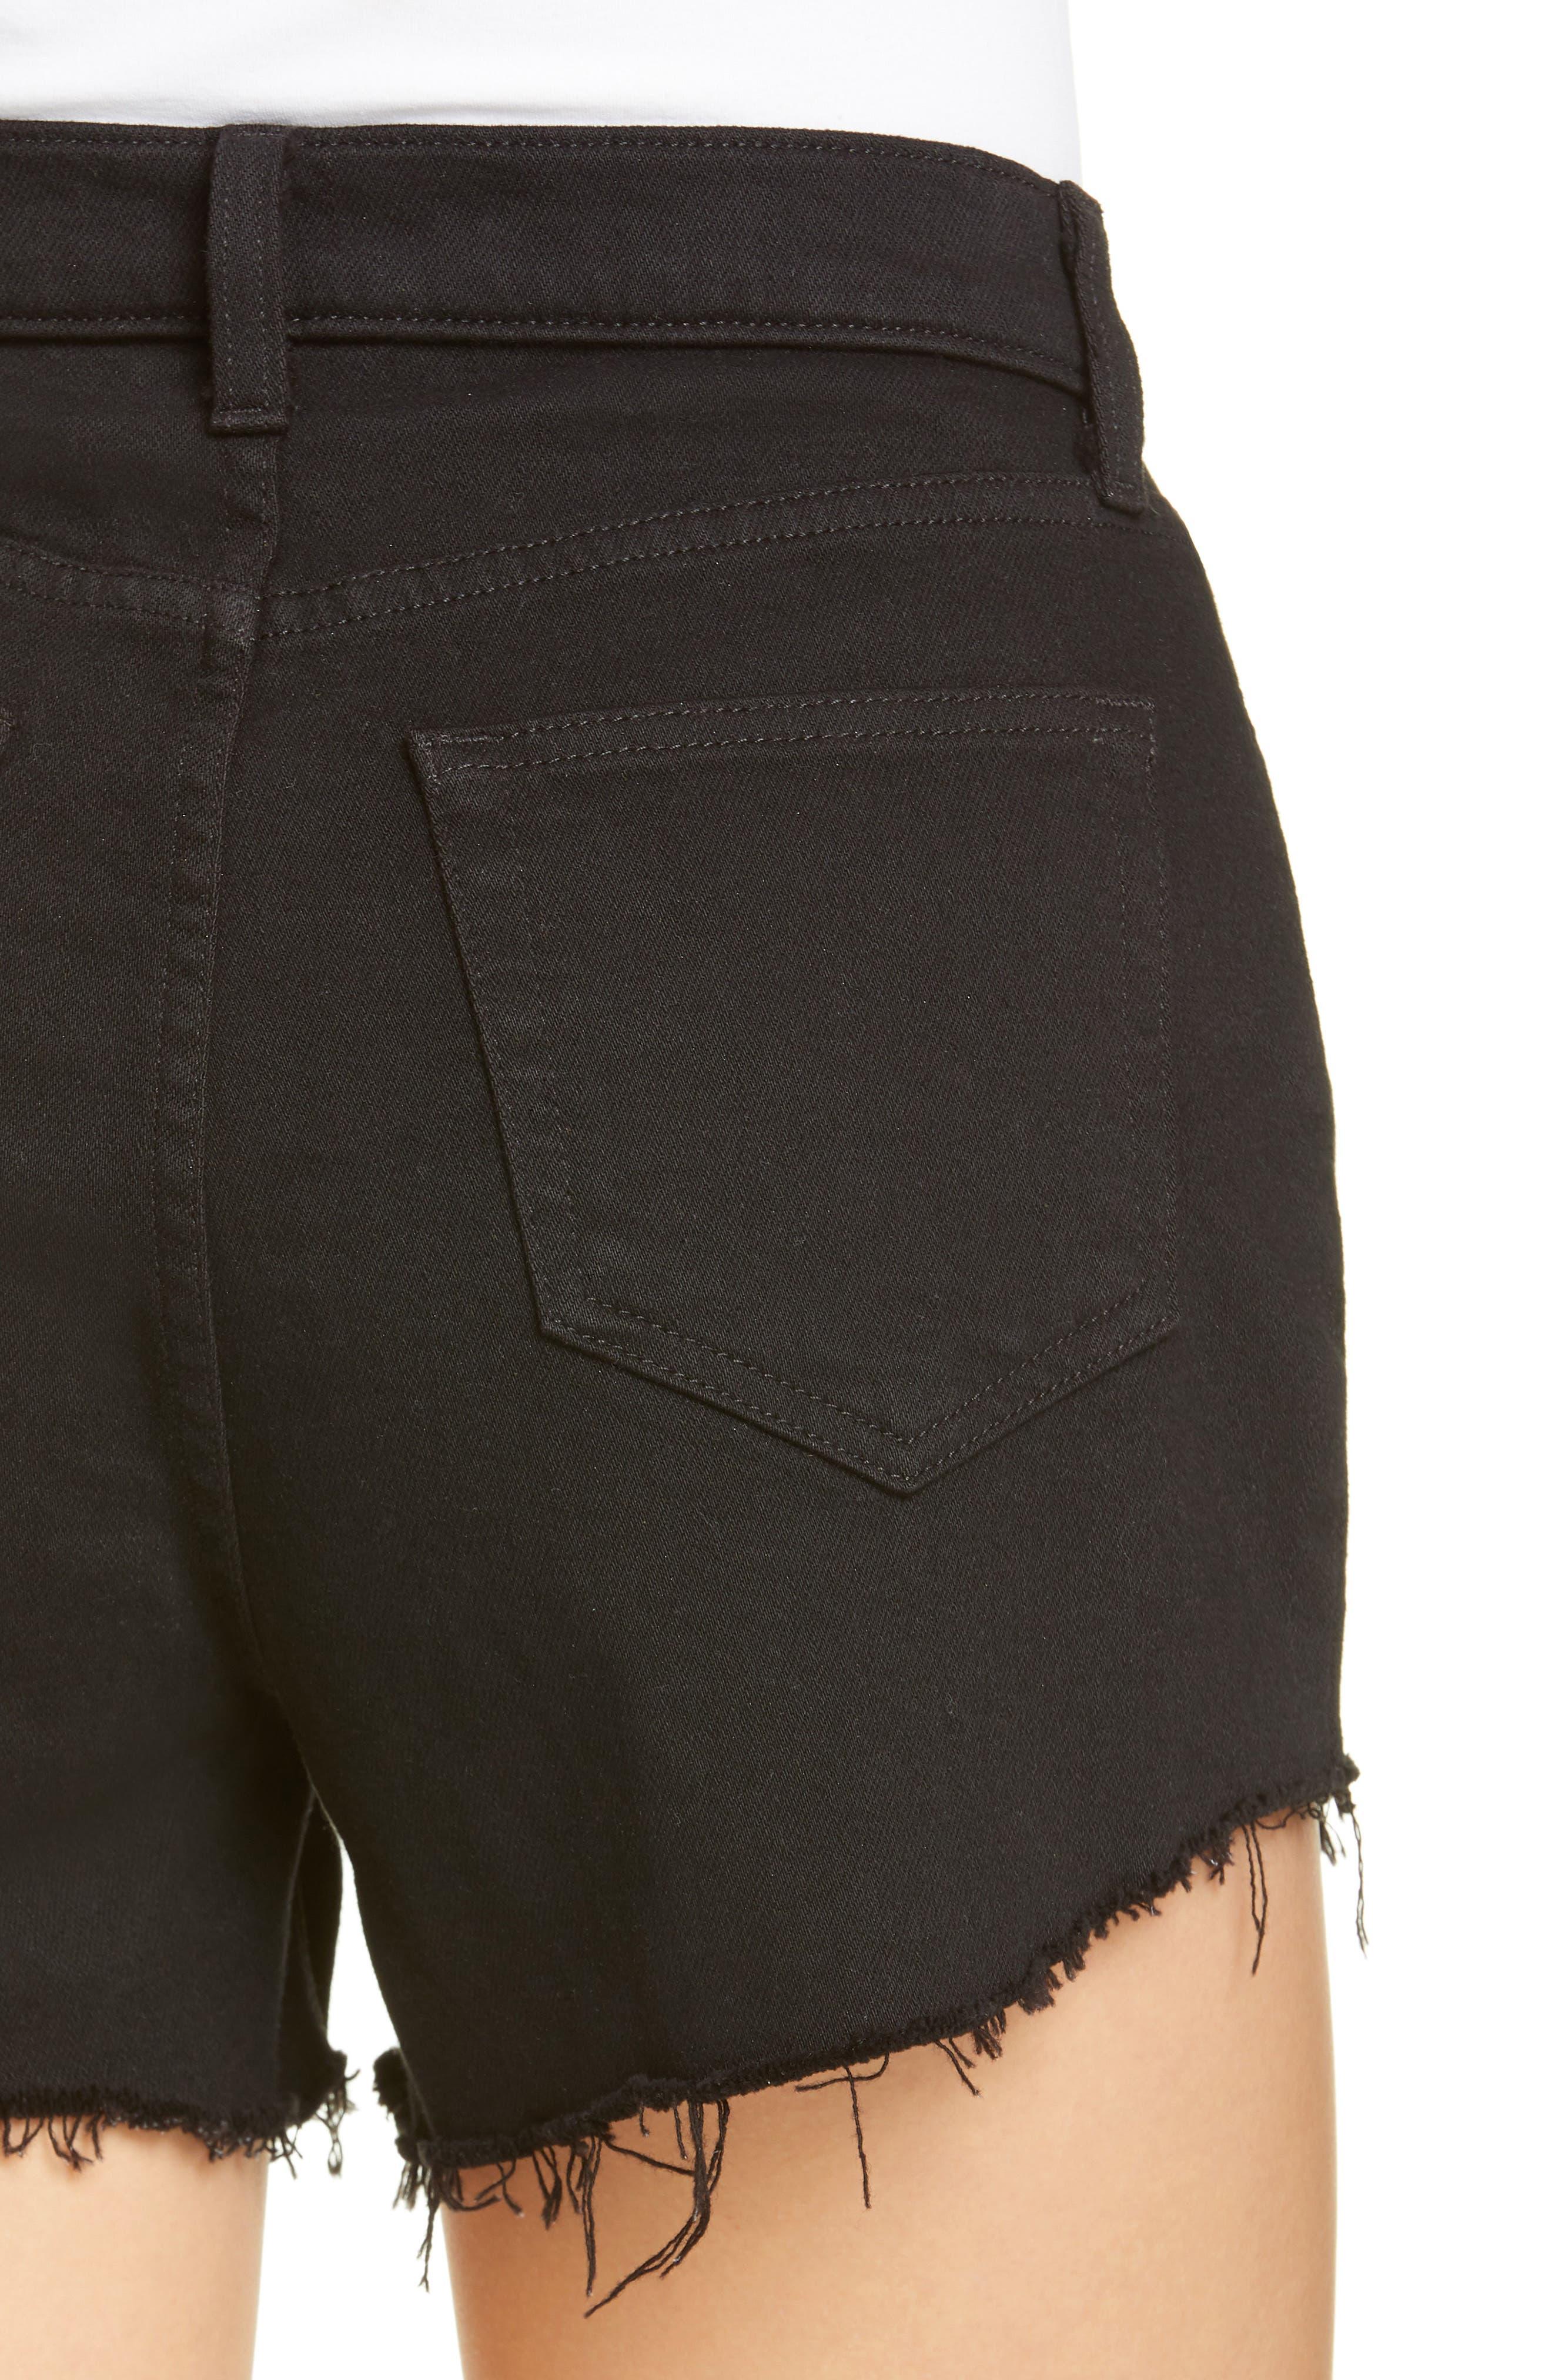 L'AGENCE, Ryland High Waist Denim Shorts, Alternate thumbnail 5, color, NOIR